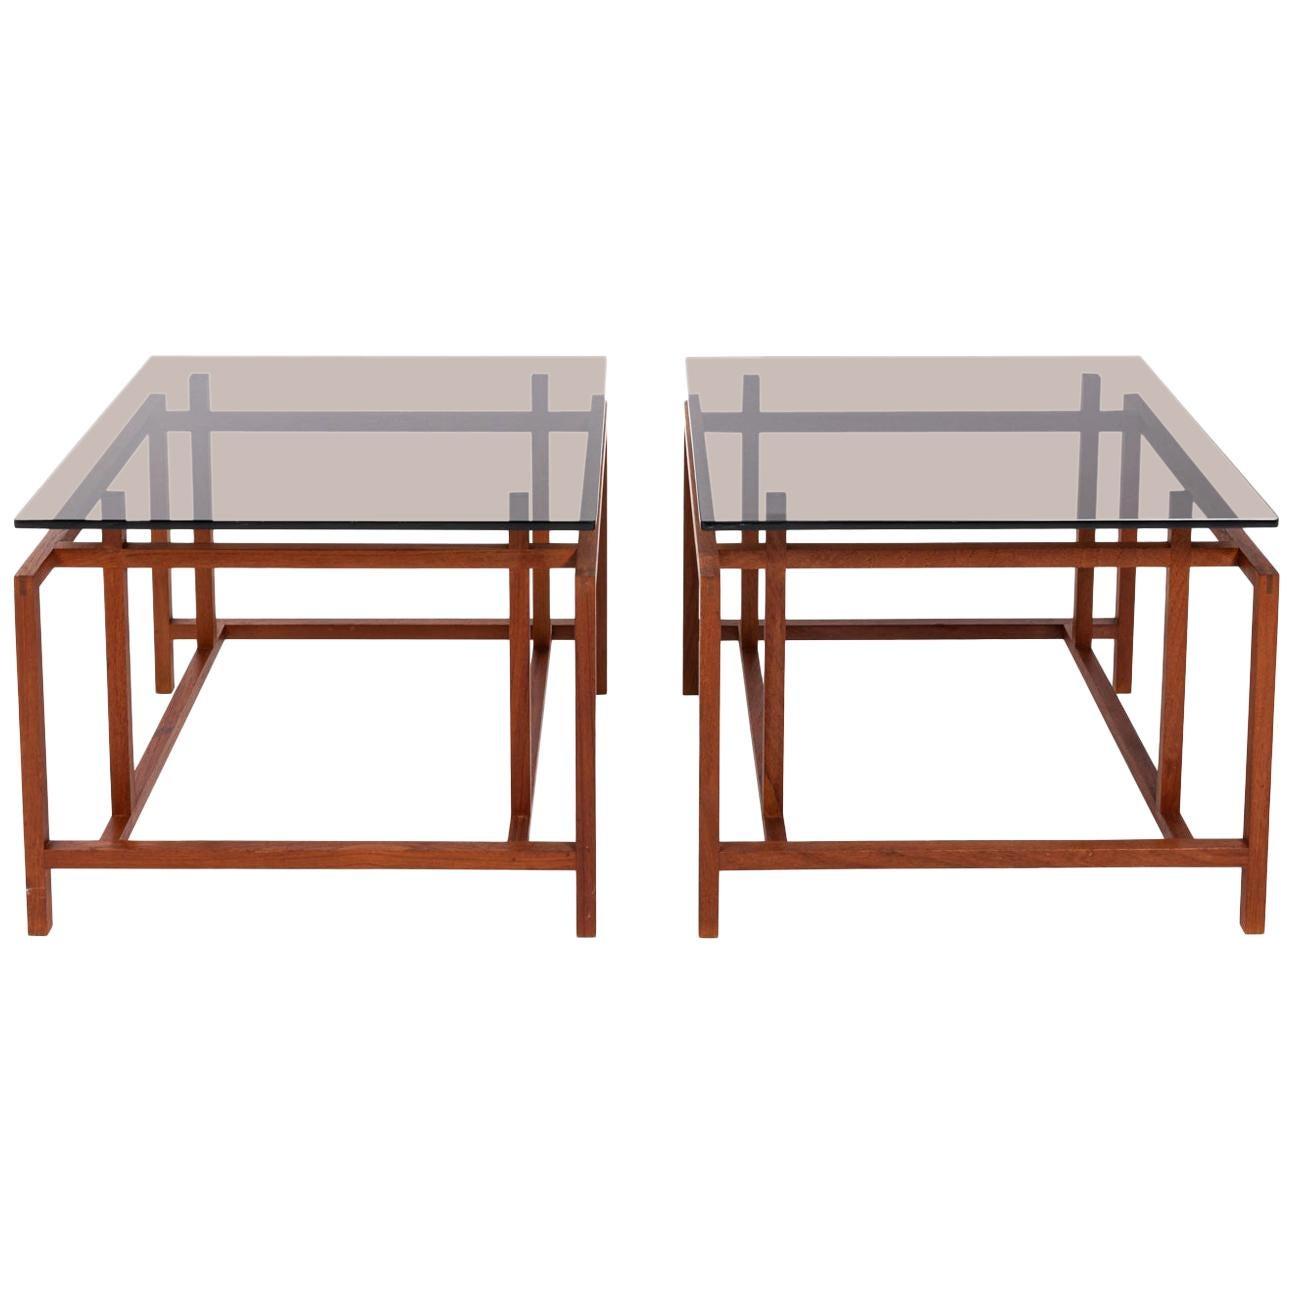 Pair of Henning Horgaard Rosewood End Tables by Komfort Mobler